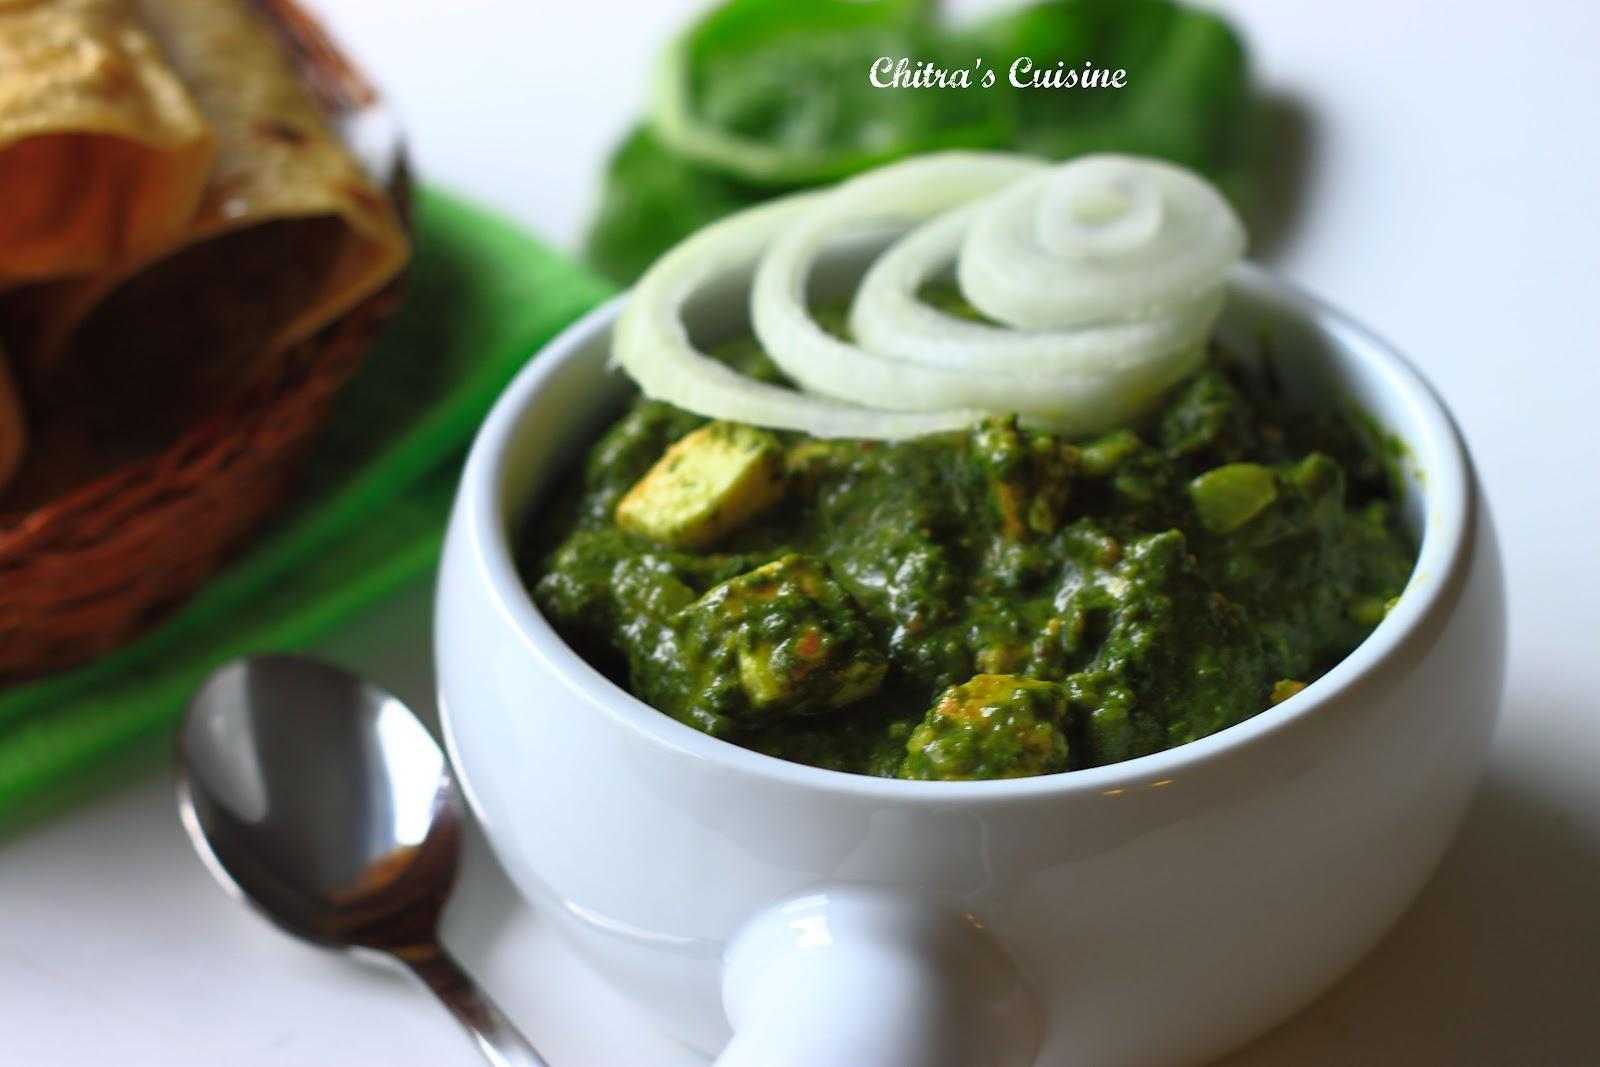 Chitra's Cuisine: Palak Paneer